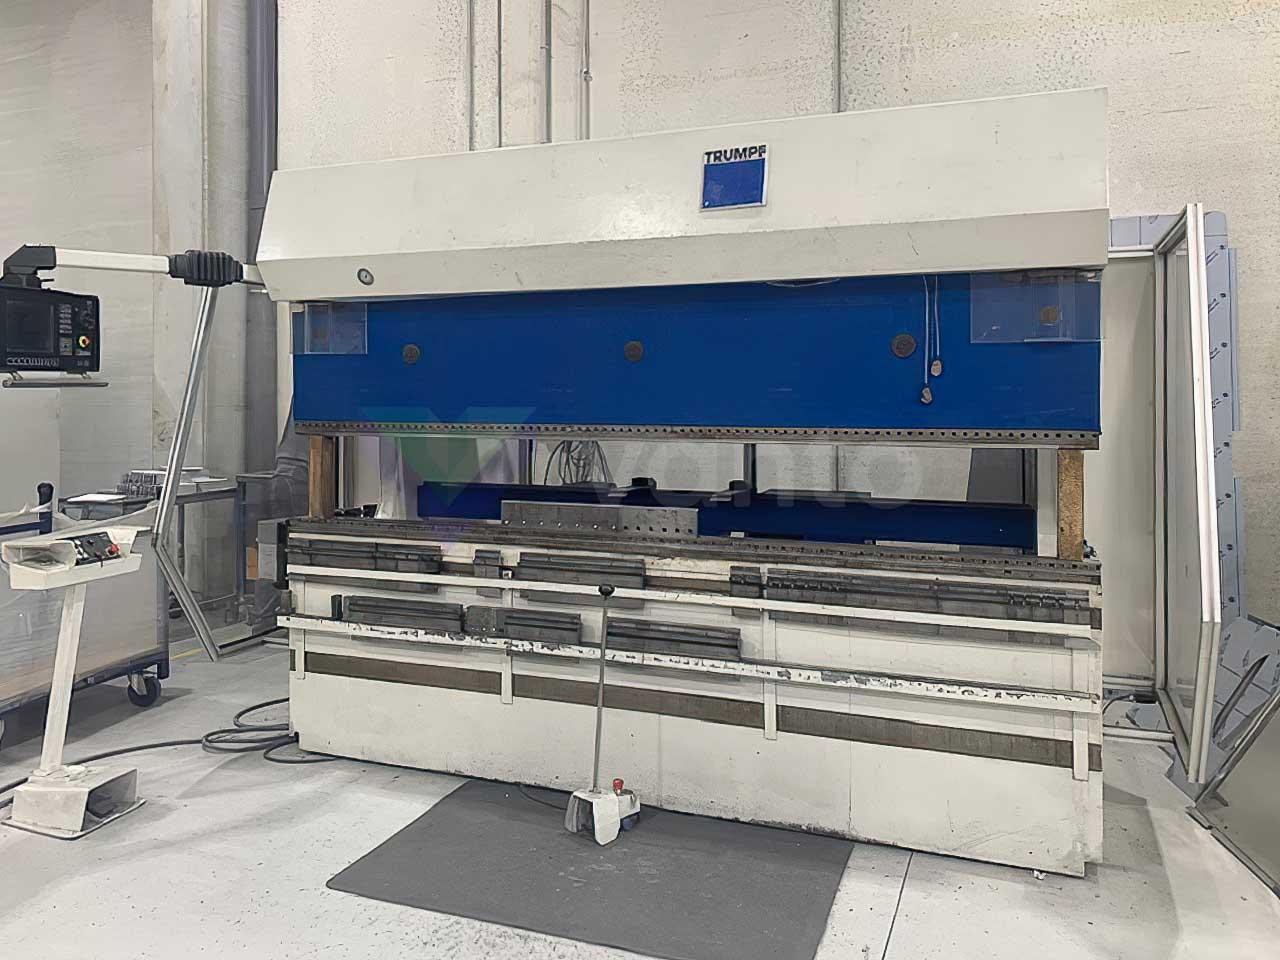 TRUMPF TrumaBend V130 CNC Bending machine (2001) id10559